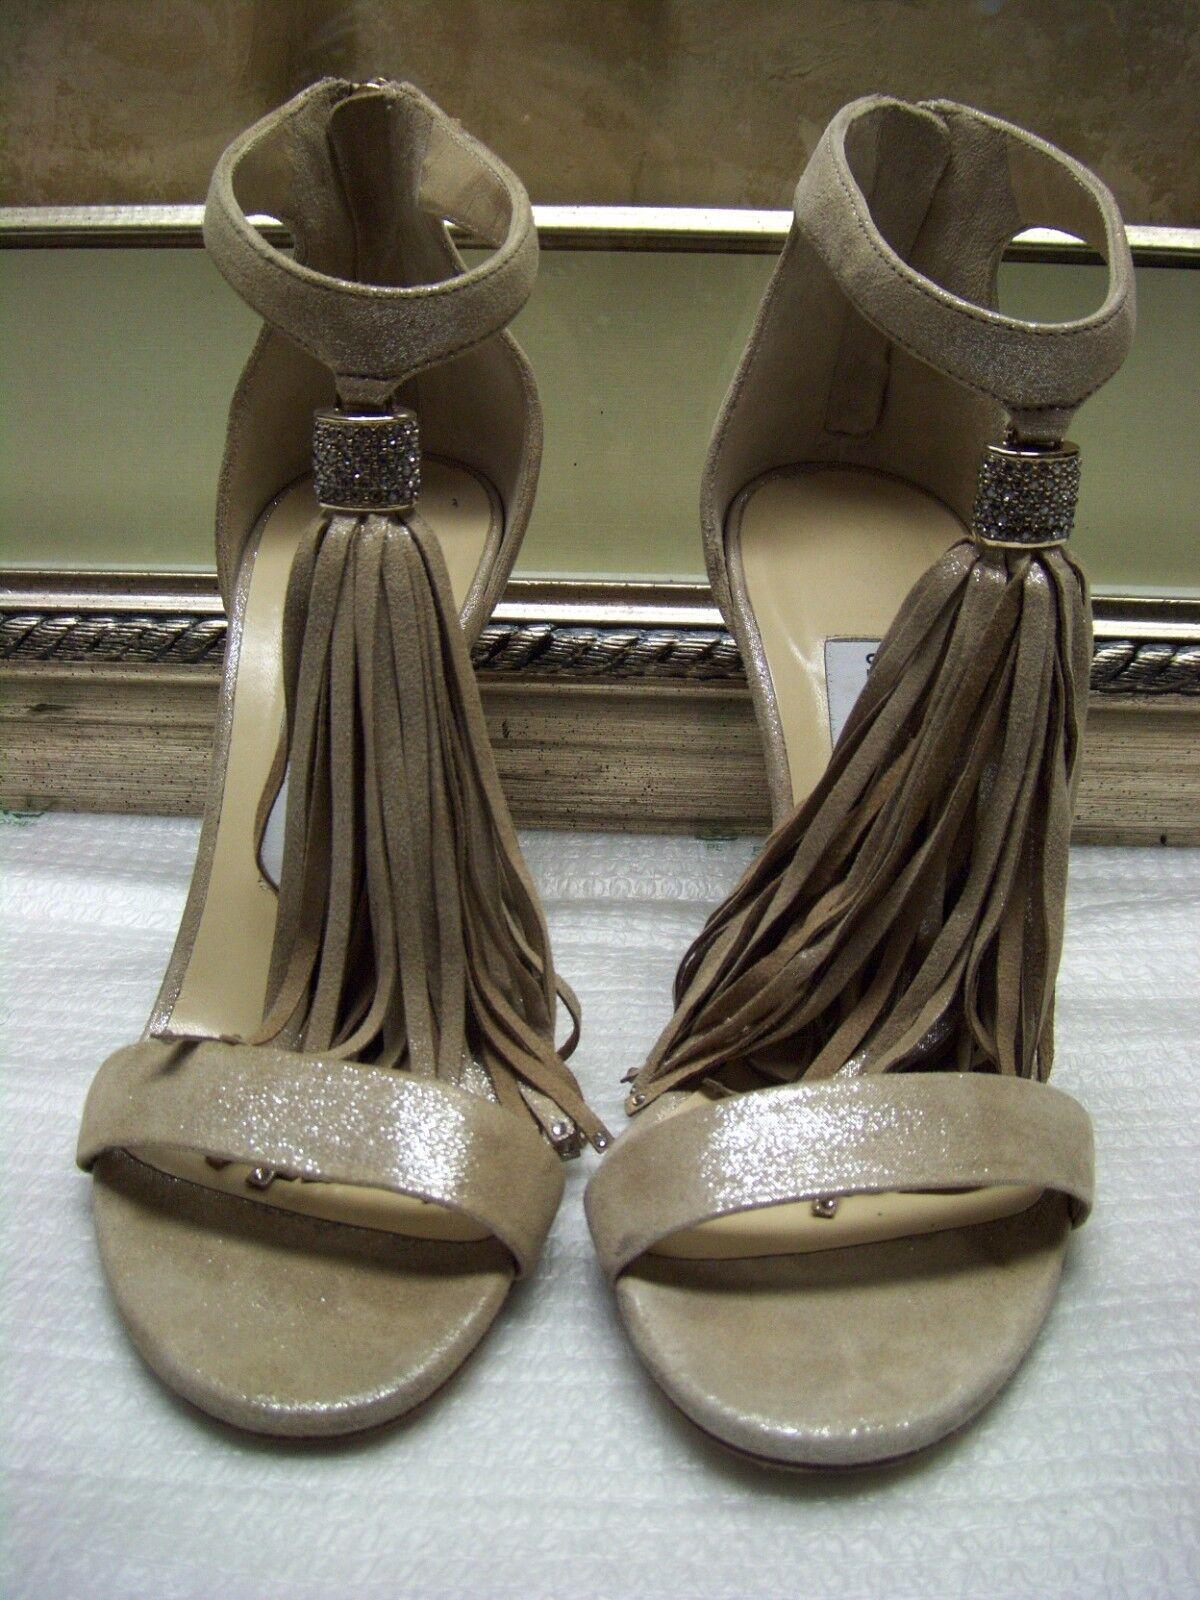 Authentic Jimmy Choo lila Ankle Strap Sandal schuhe schuhe schuhe Größe 35.5  975.00 f11467